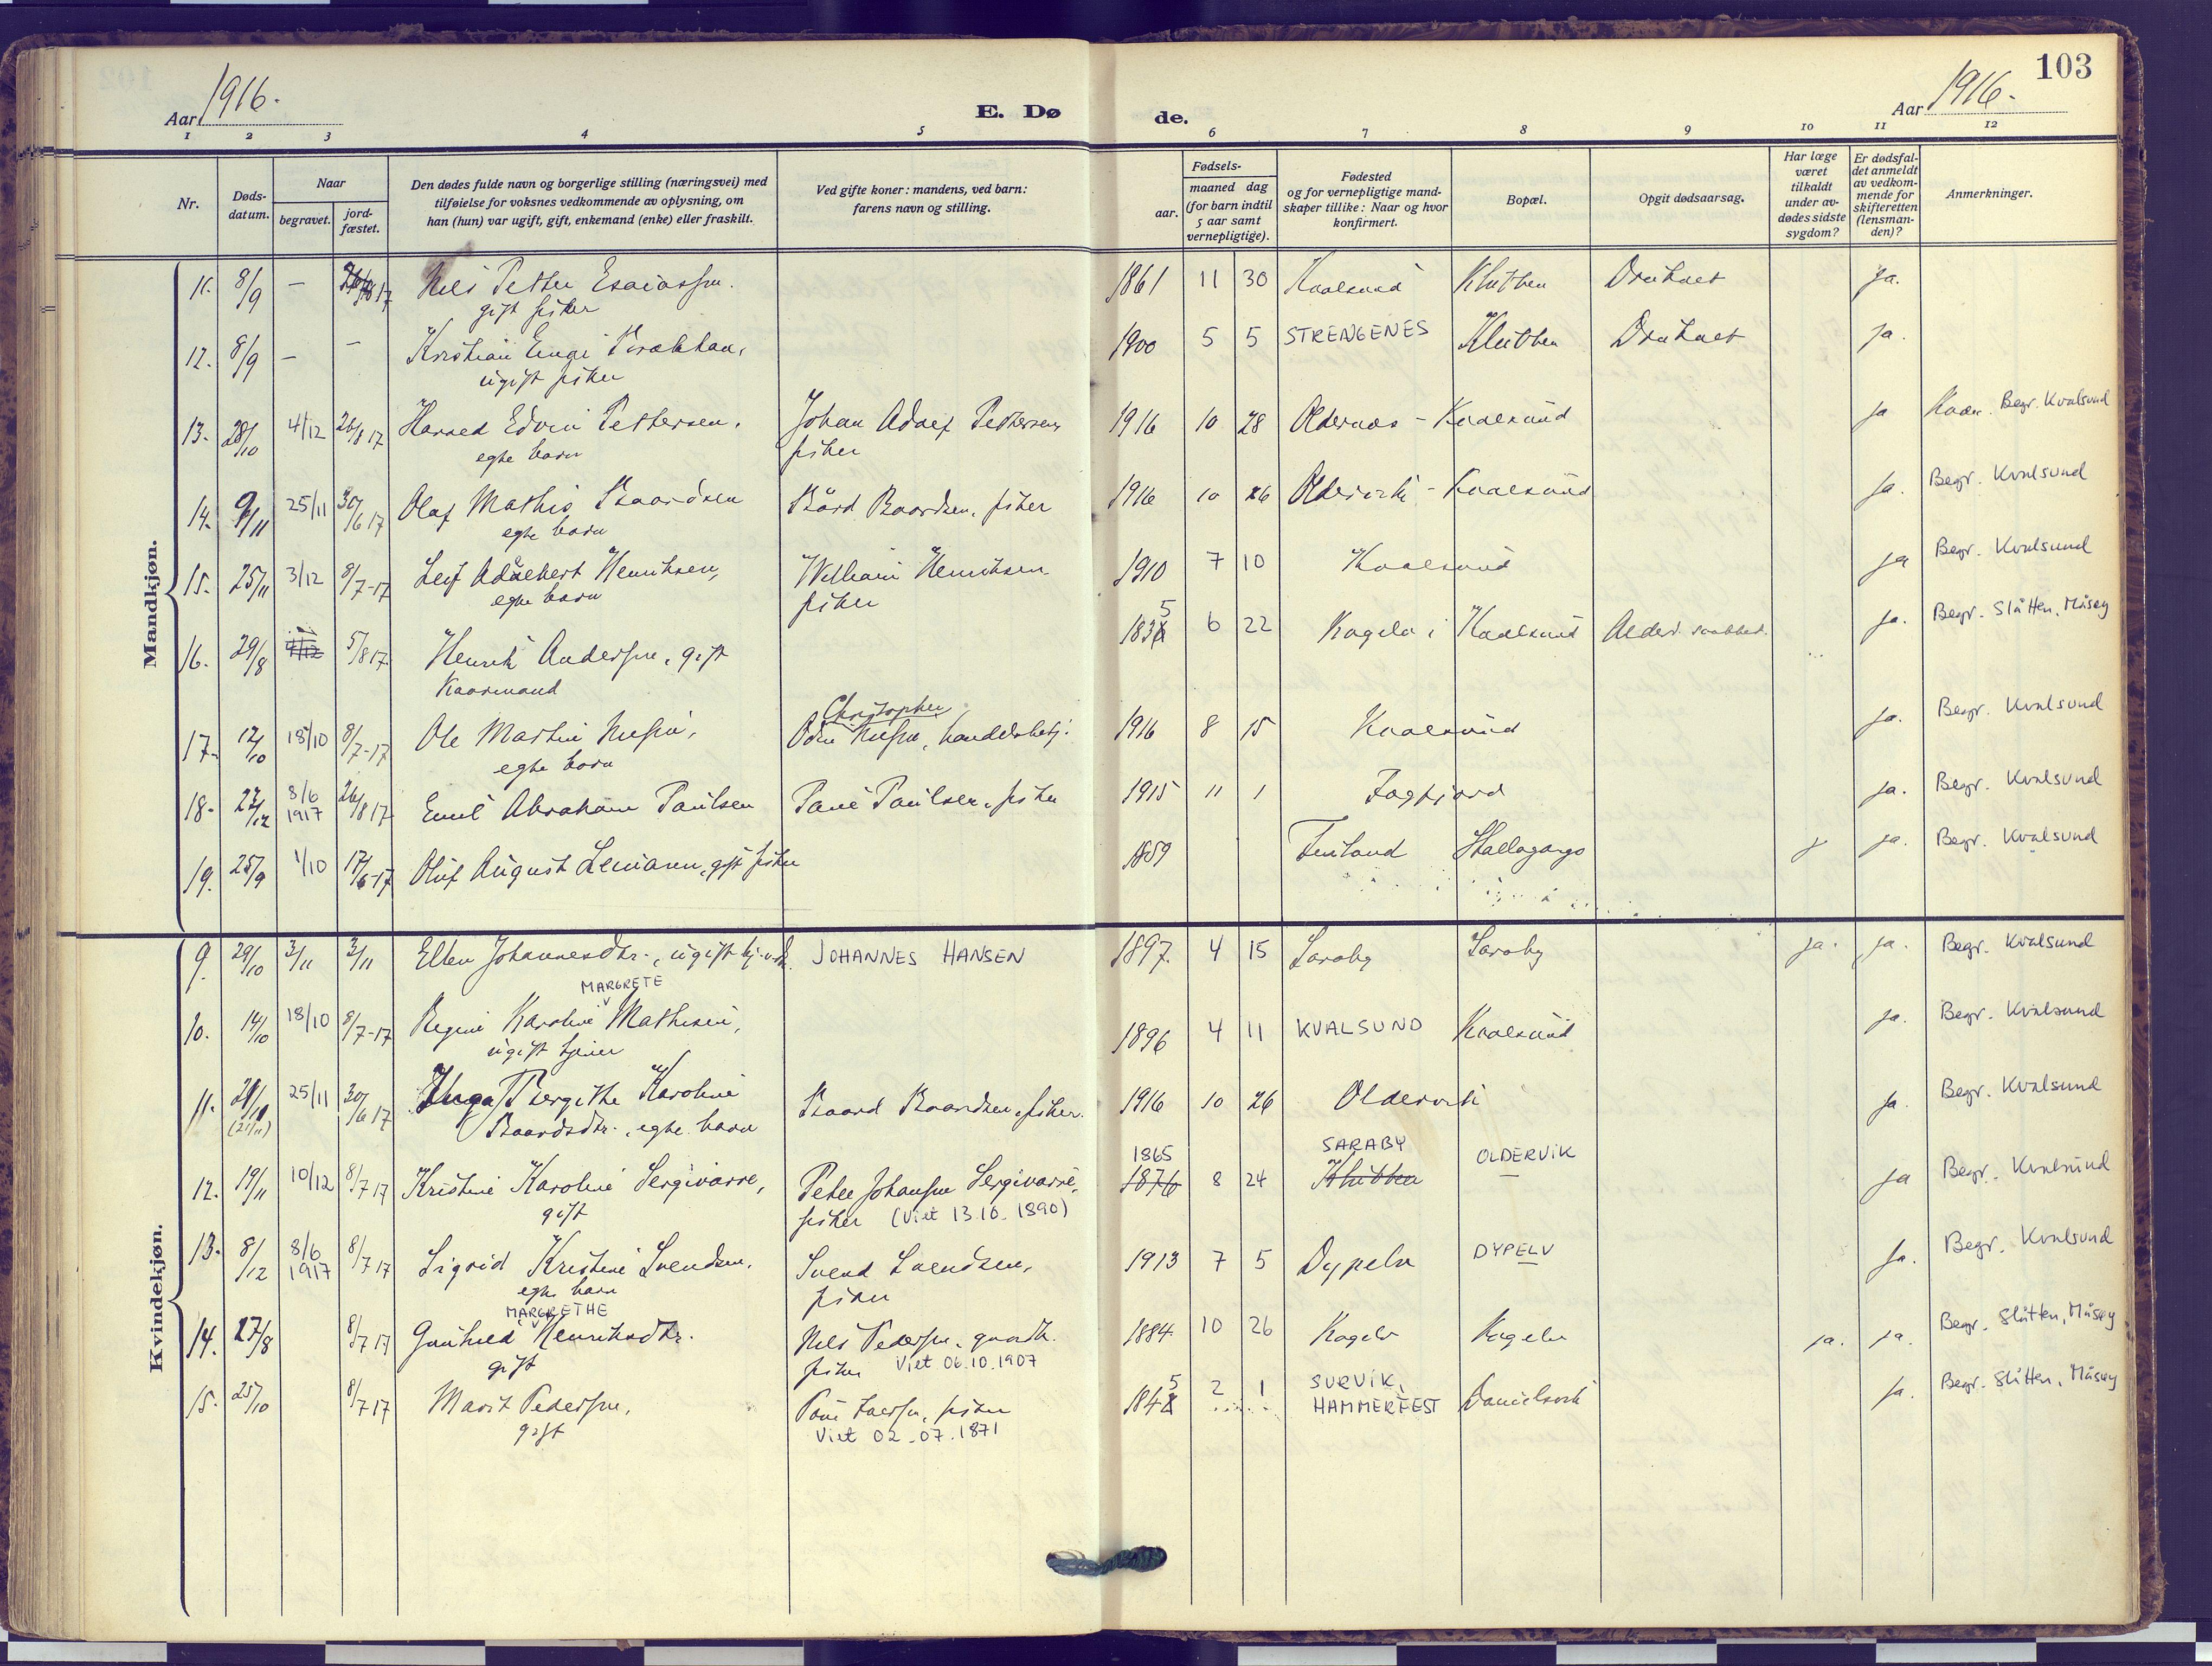 SATØ, Hammerfest sokneprestembete, Ministerialbok nr. 16, 1908-1923, s. 103